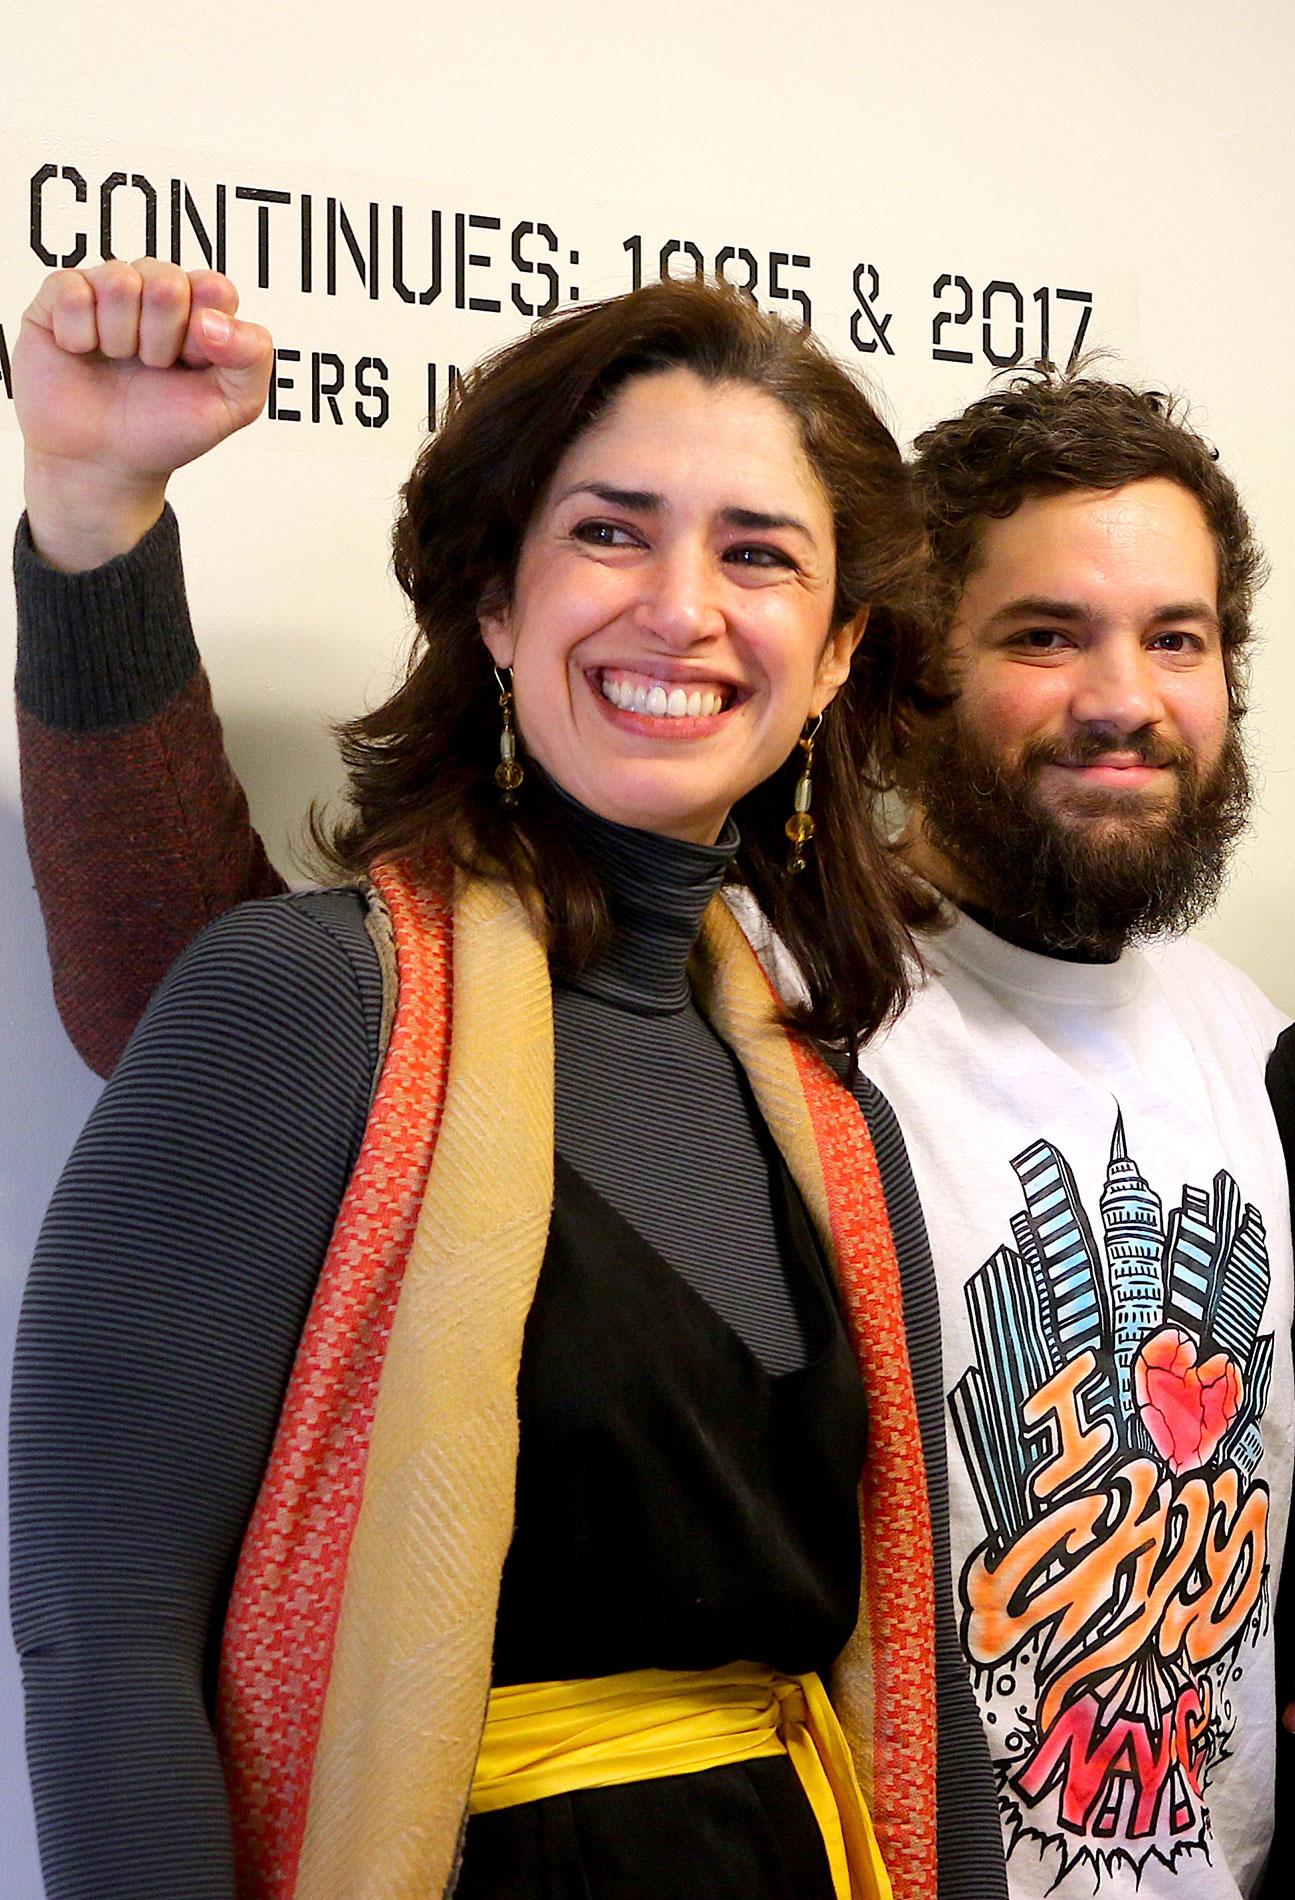 Libertad Guerra & Alejandro Epifanio   Photo © Camille Perrottet